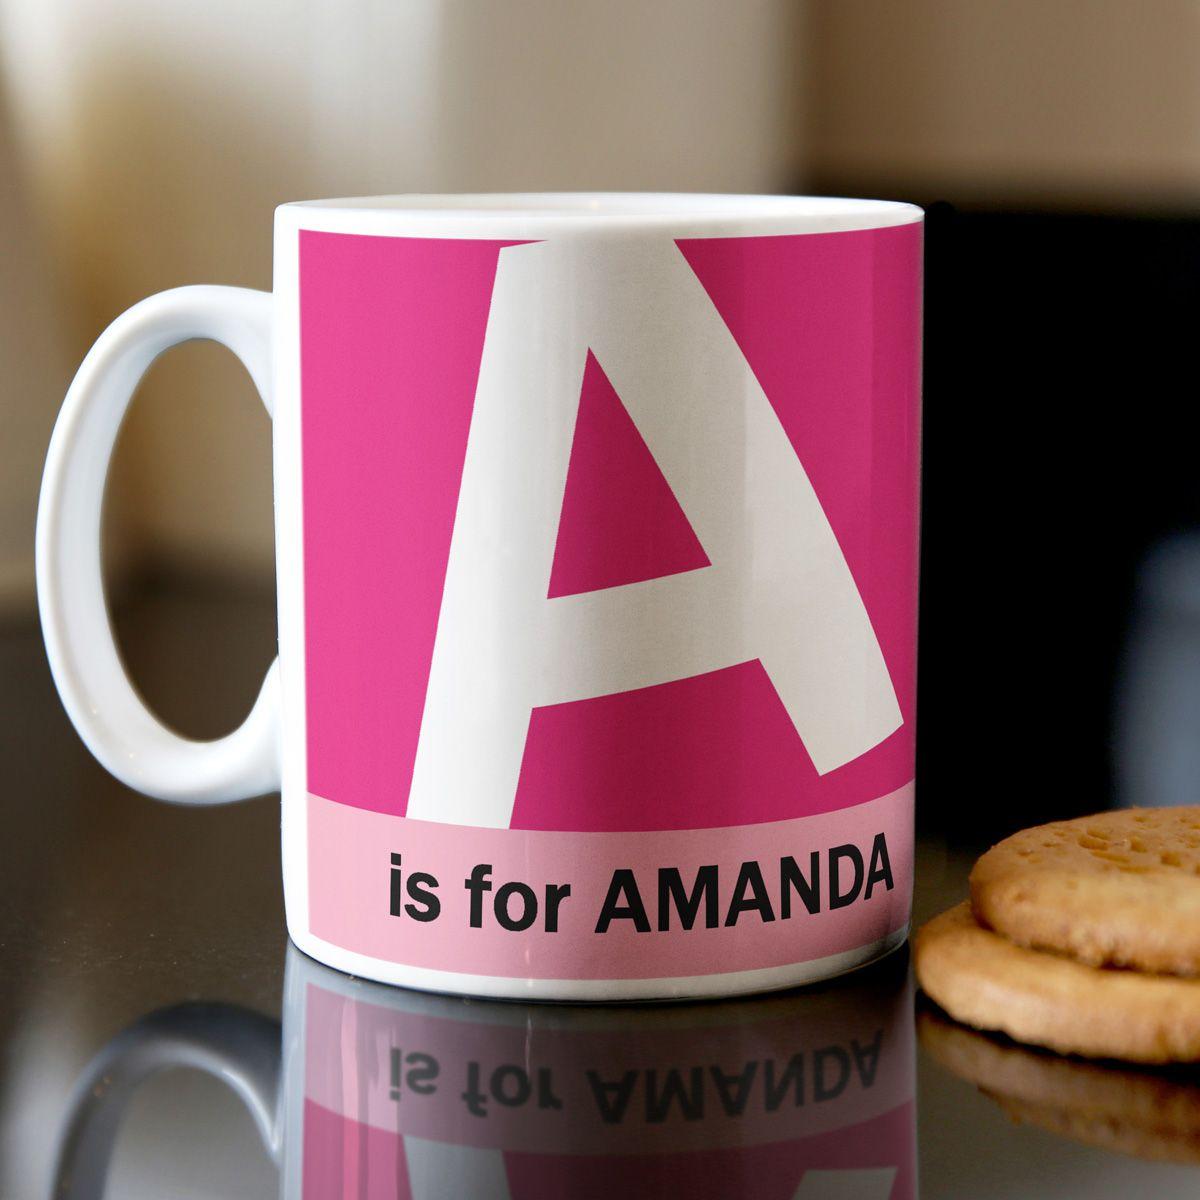 Personalised Mugs   GettingPersonal.co.uk   Mug Ideas   Pinterest ...